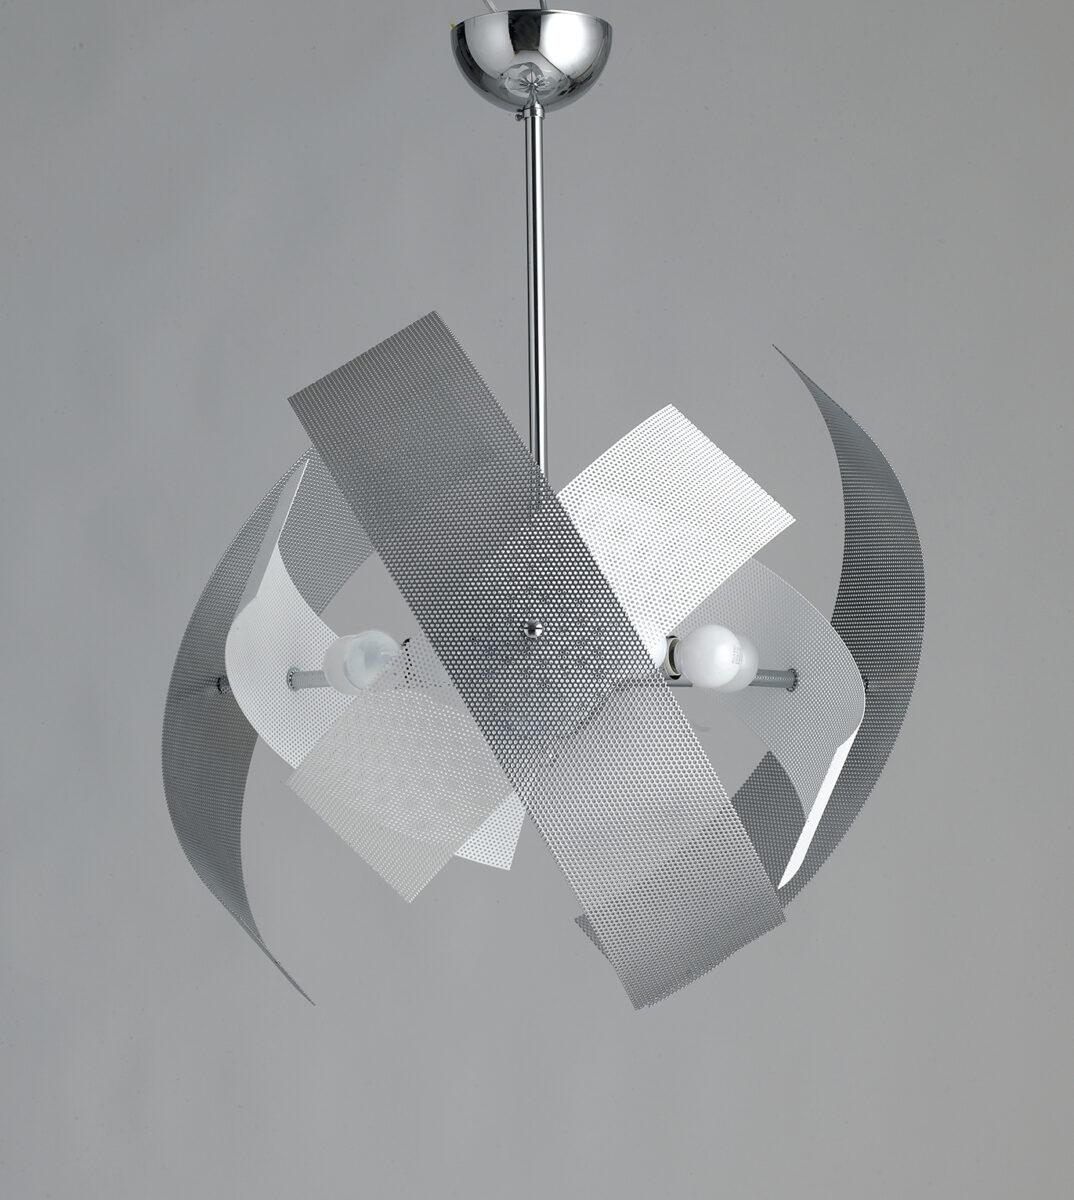 Lampadari moderni vetro colorato - Cucina lampadari ...